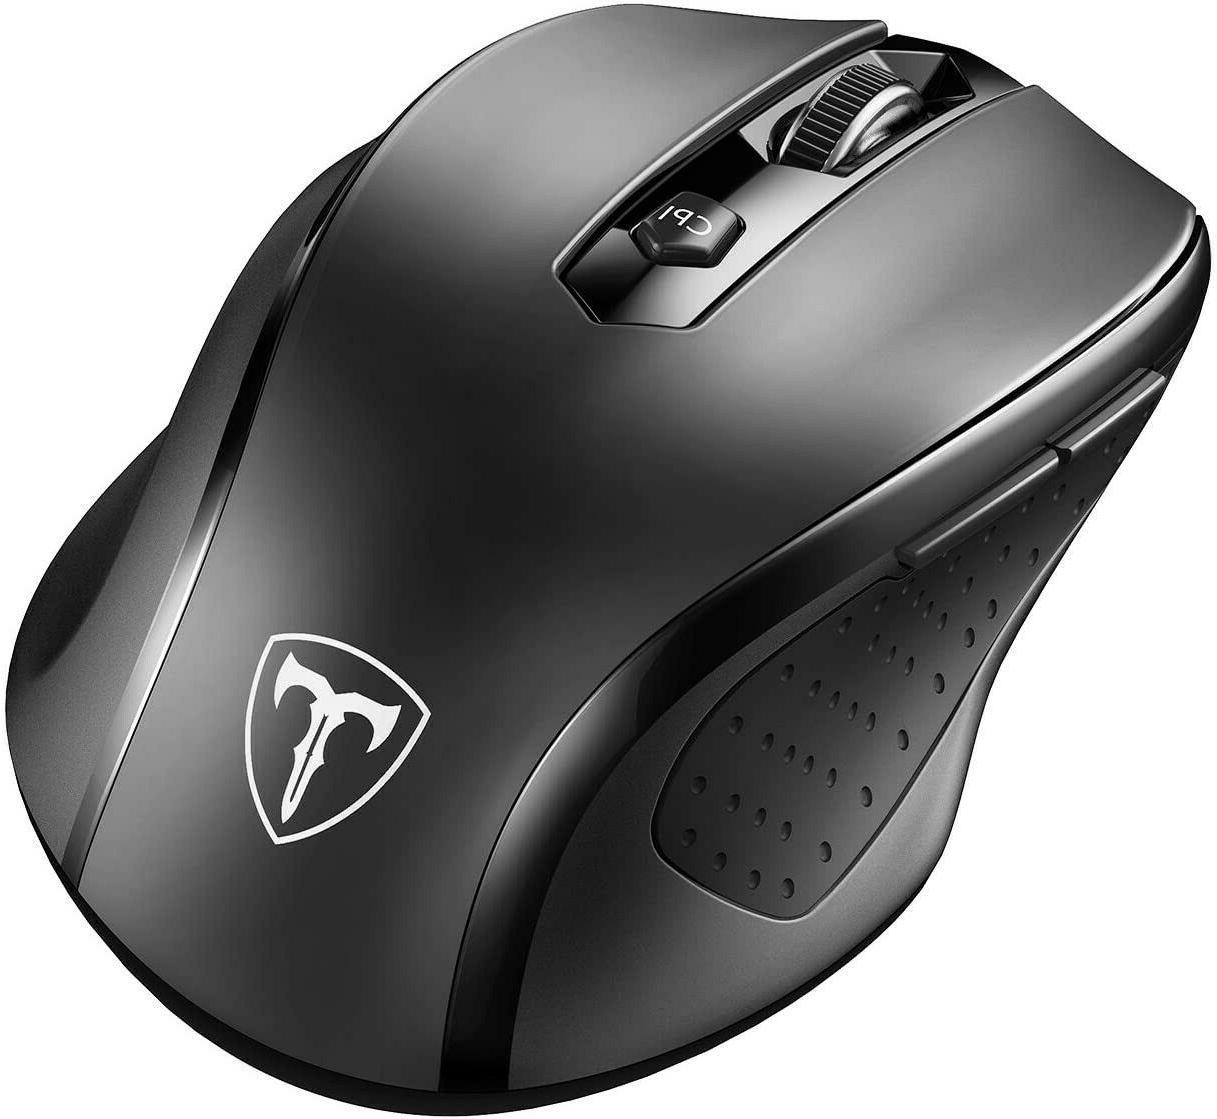 new mm057 2 4g wireless optical mouseblack